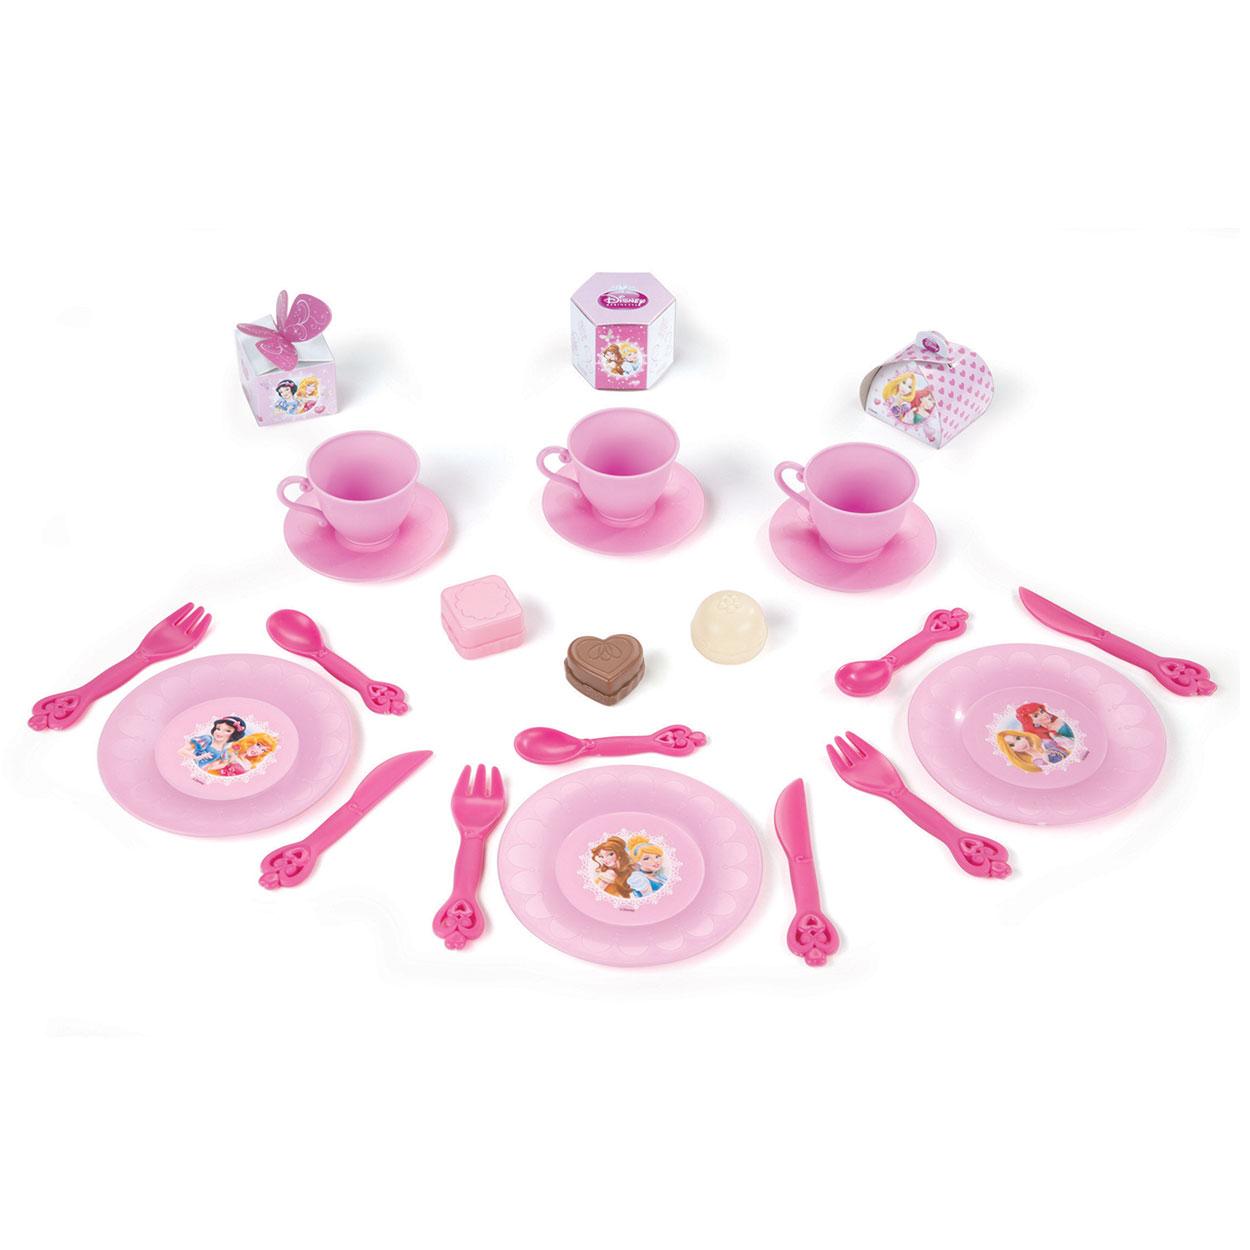 Disney Keukenaccessoires : Smoby Disney Prinses Picknickmand online kopen Lobbes nl